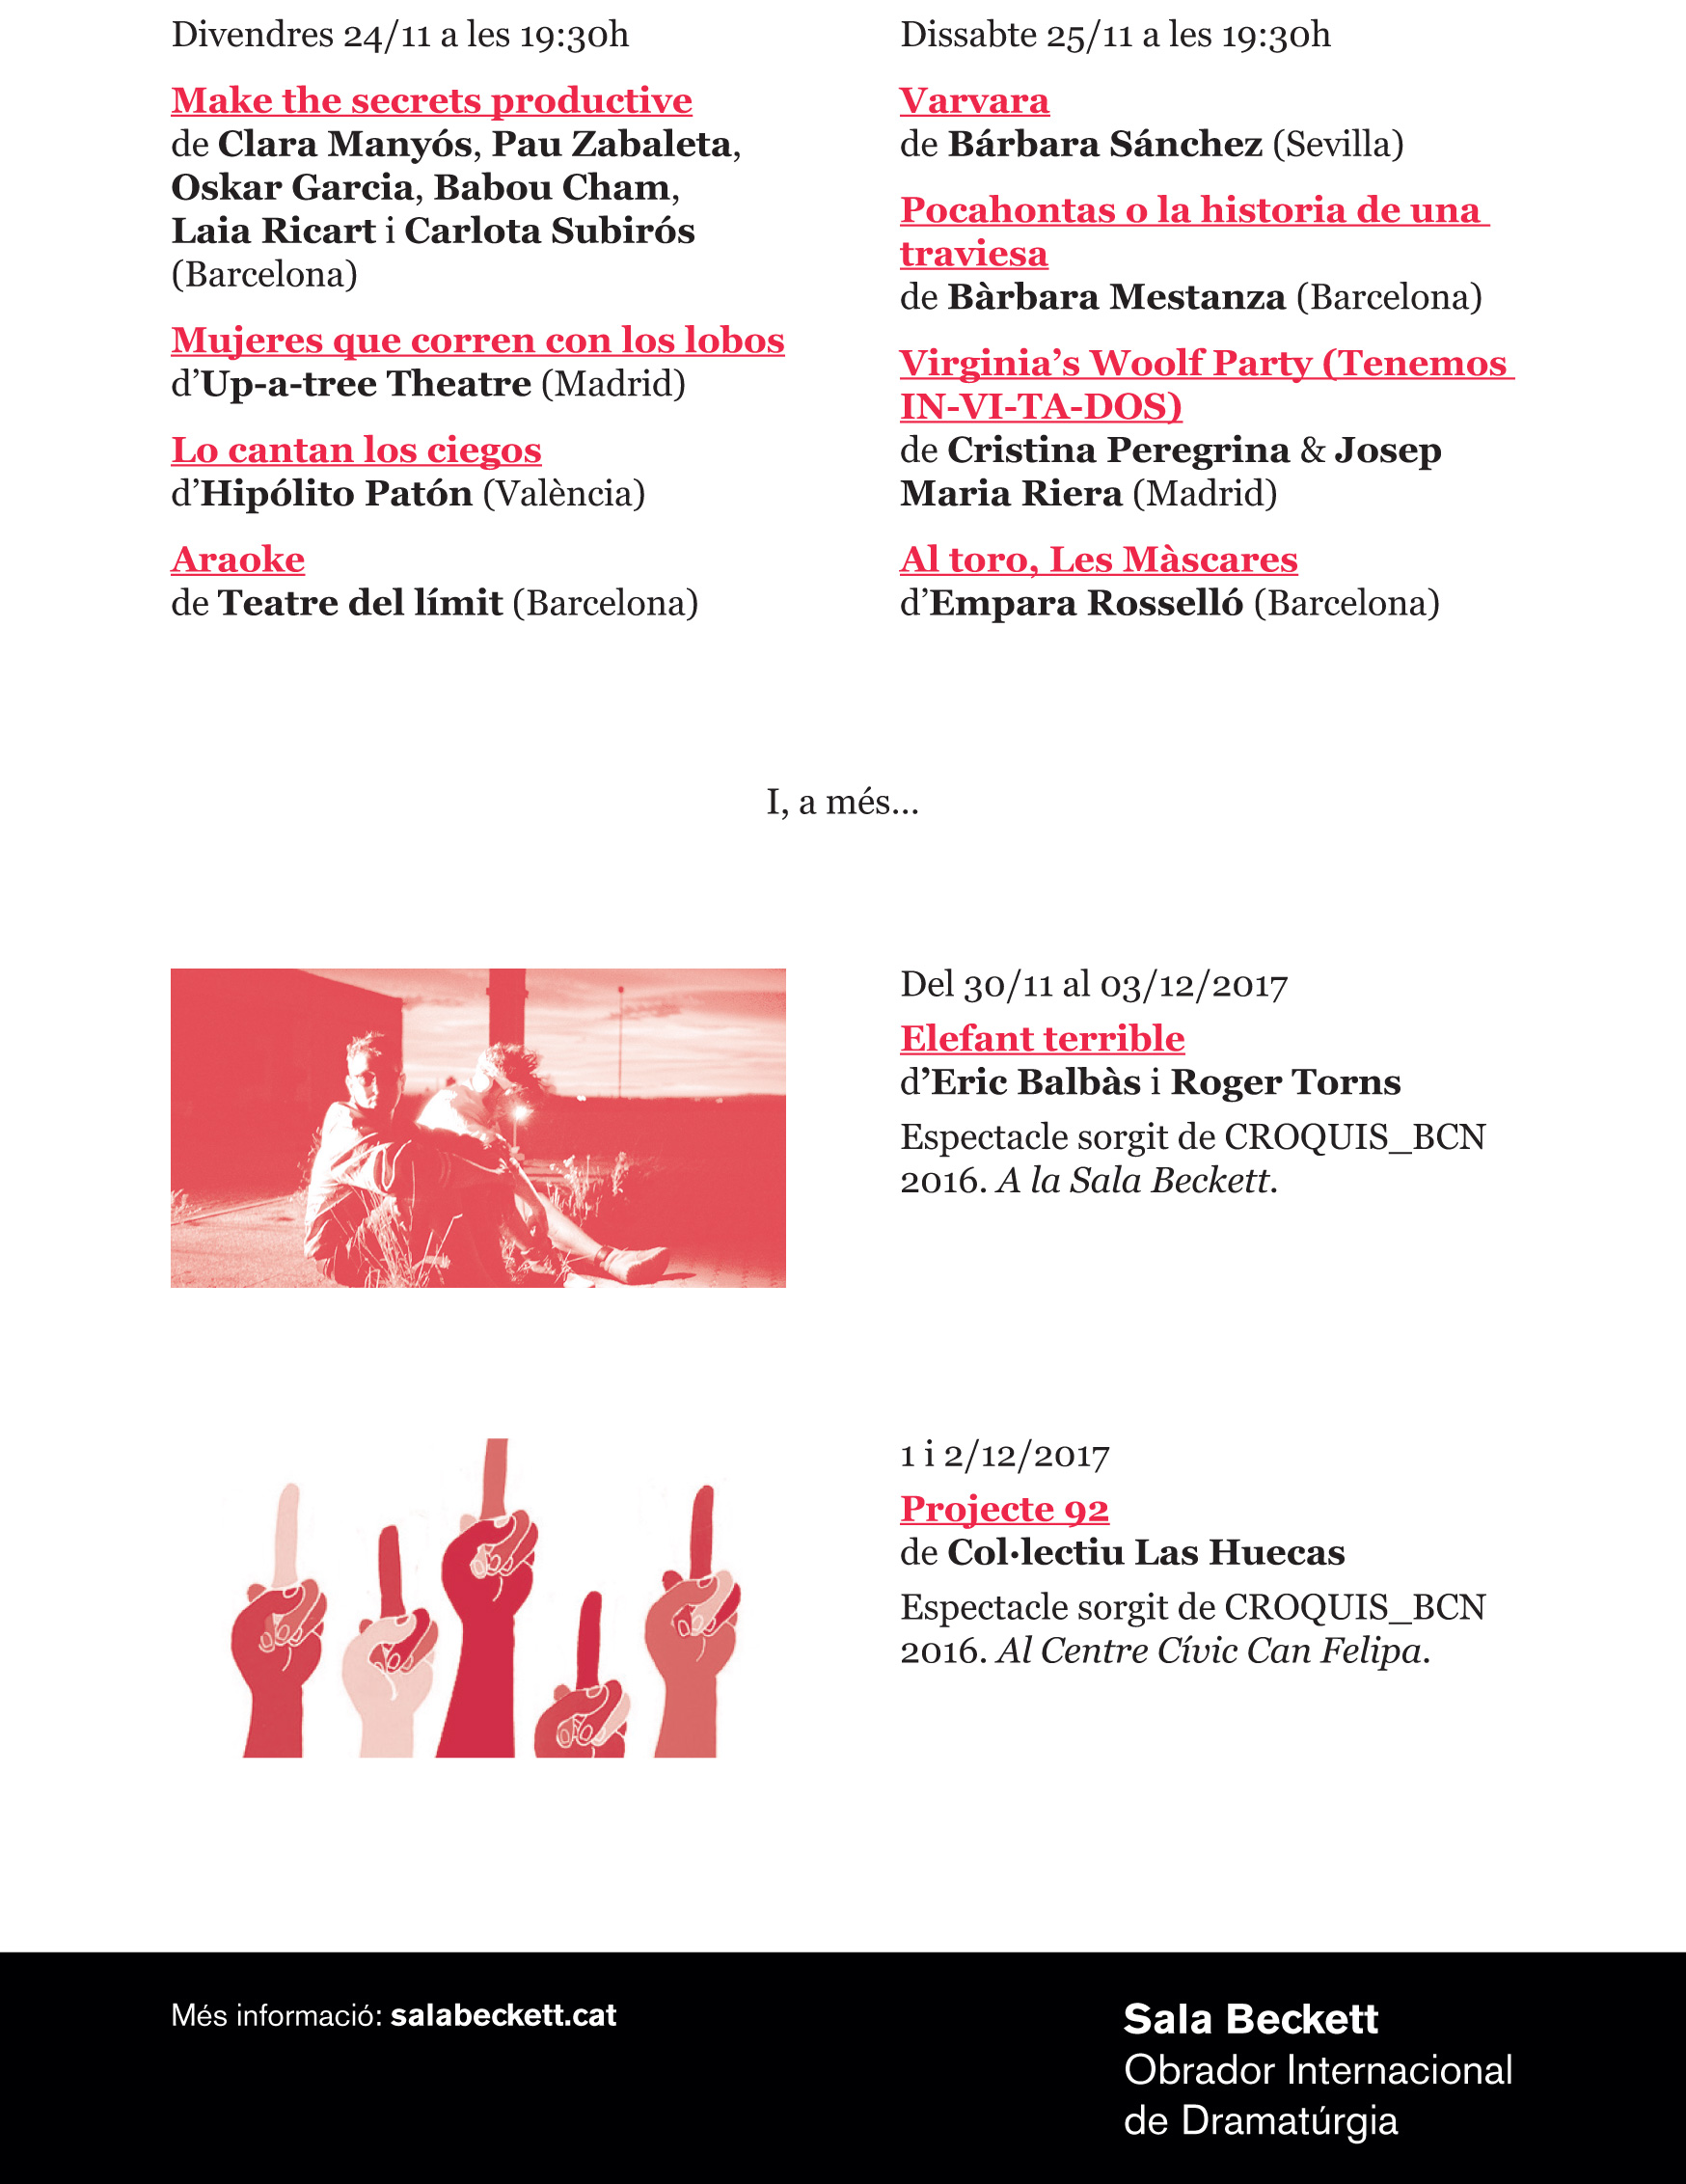 ... Sala Beckett   Obrador Internacional de Dramatúrgia. 2017 Edition.  flyer croquis v2(1)-1 flyer croquis v2(1)-2 eb66277fbdc